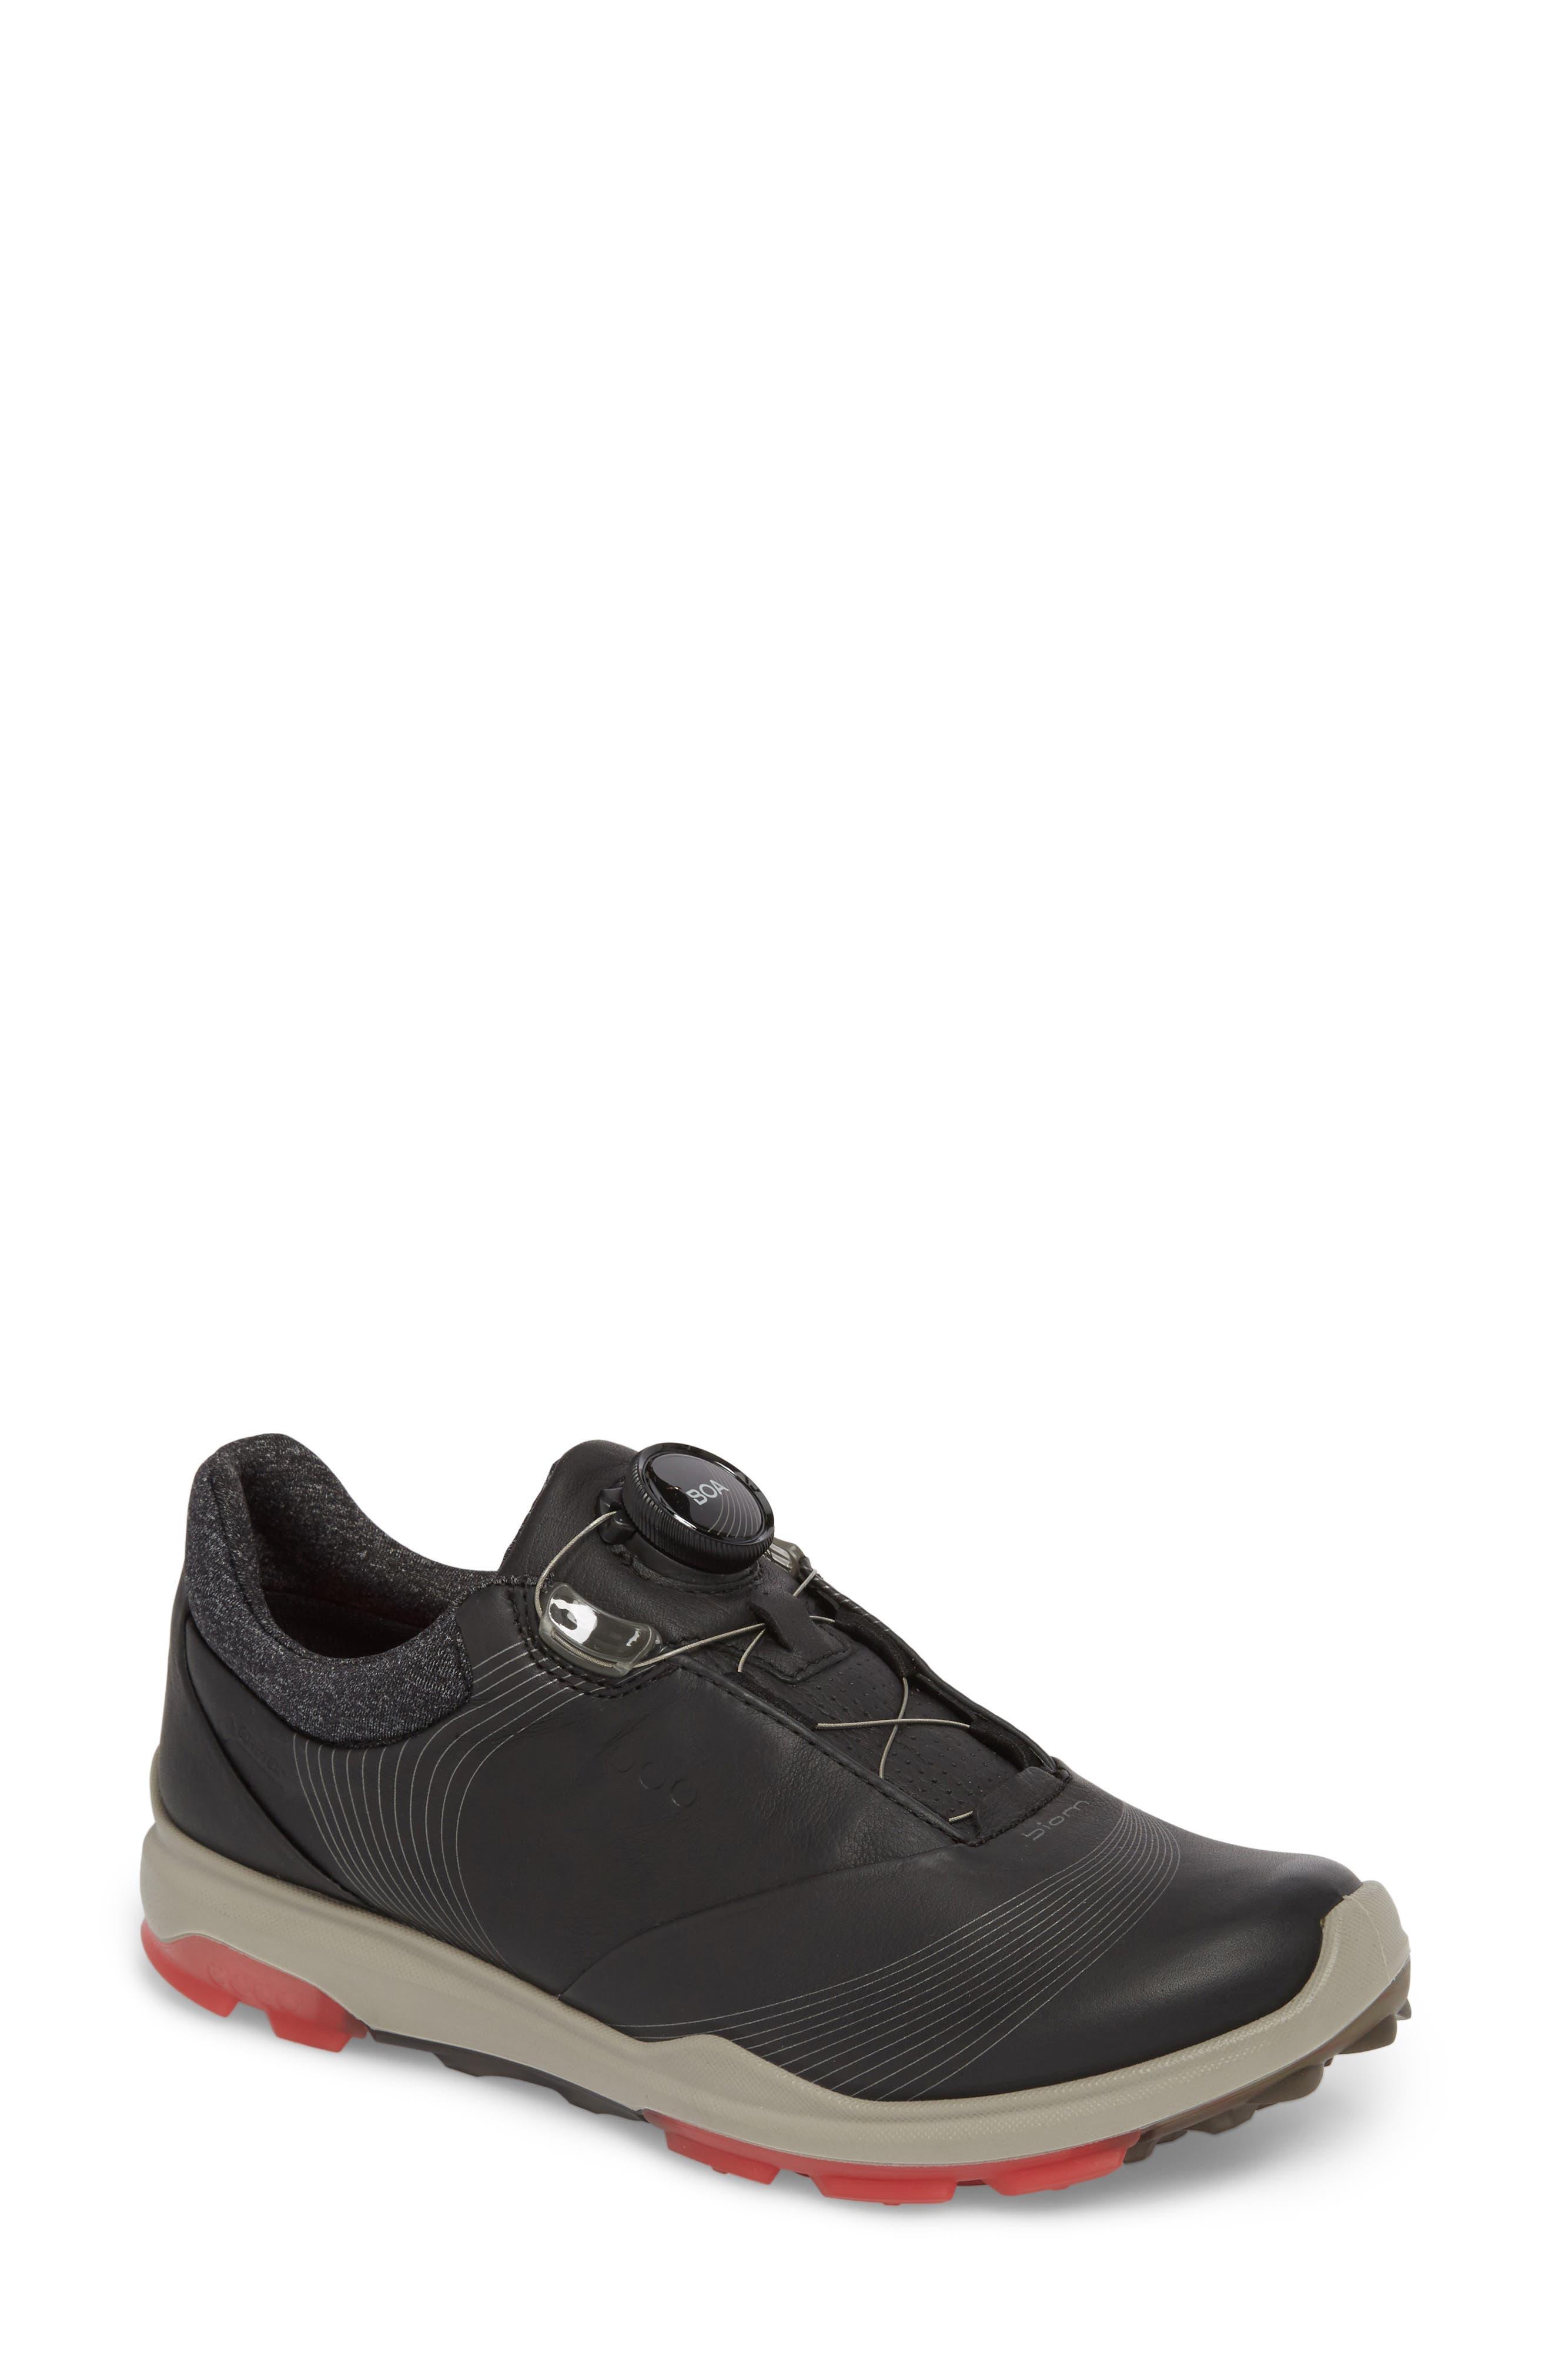 Ecco Golf Biom Hybrid 3 Sneaker, Black